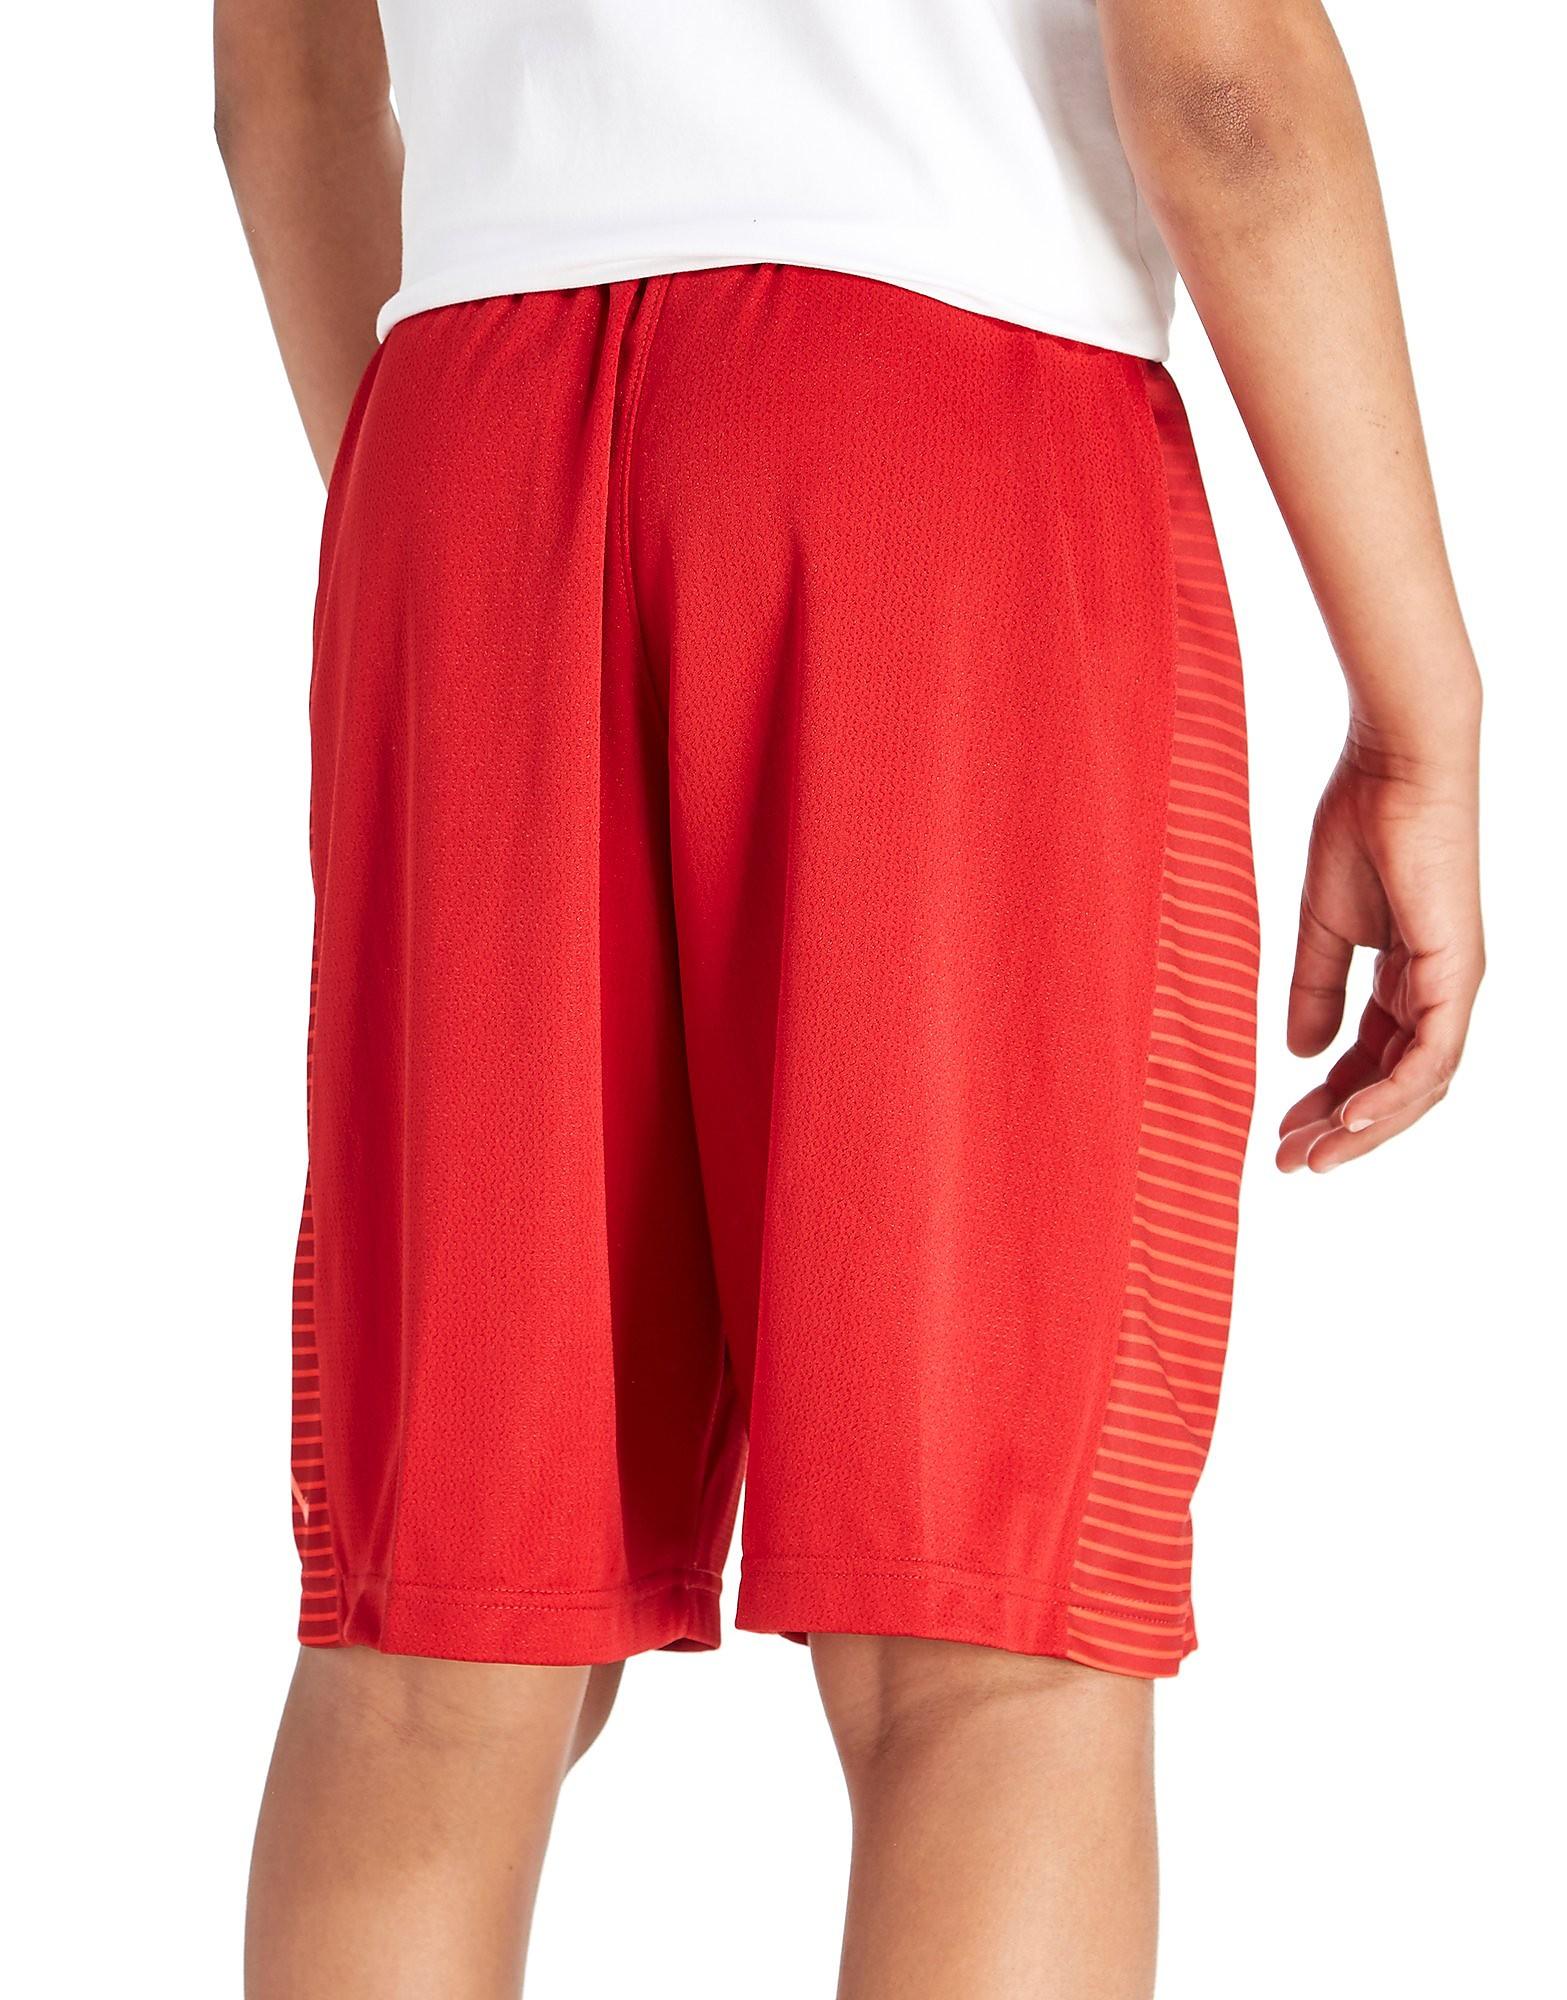 Jordan Game Shorts Juinor